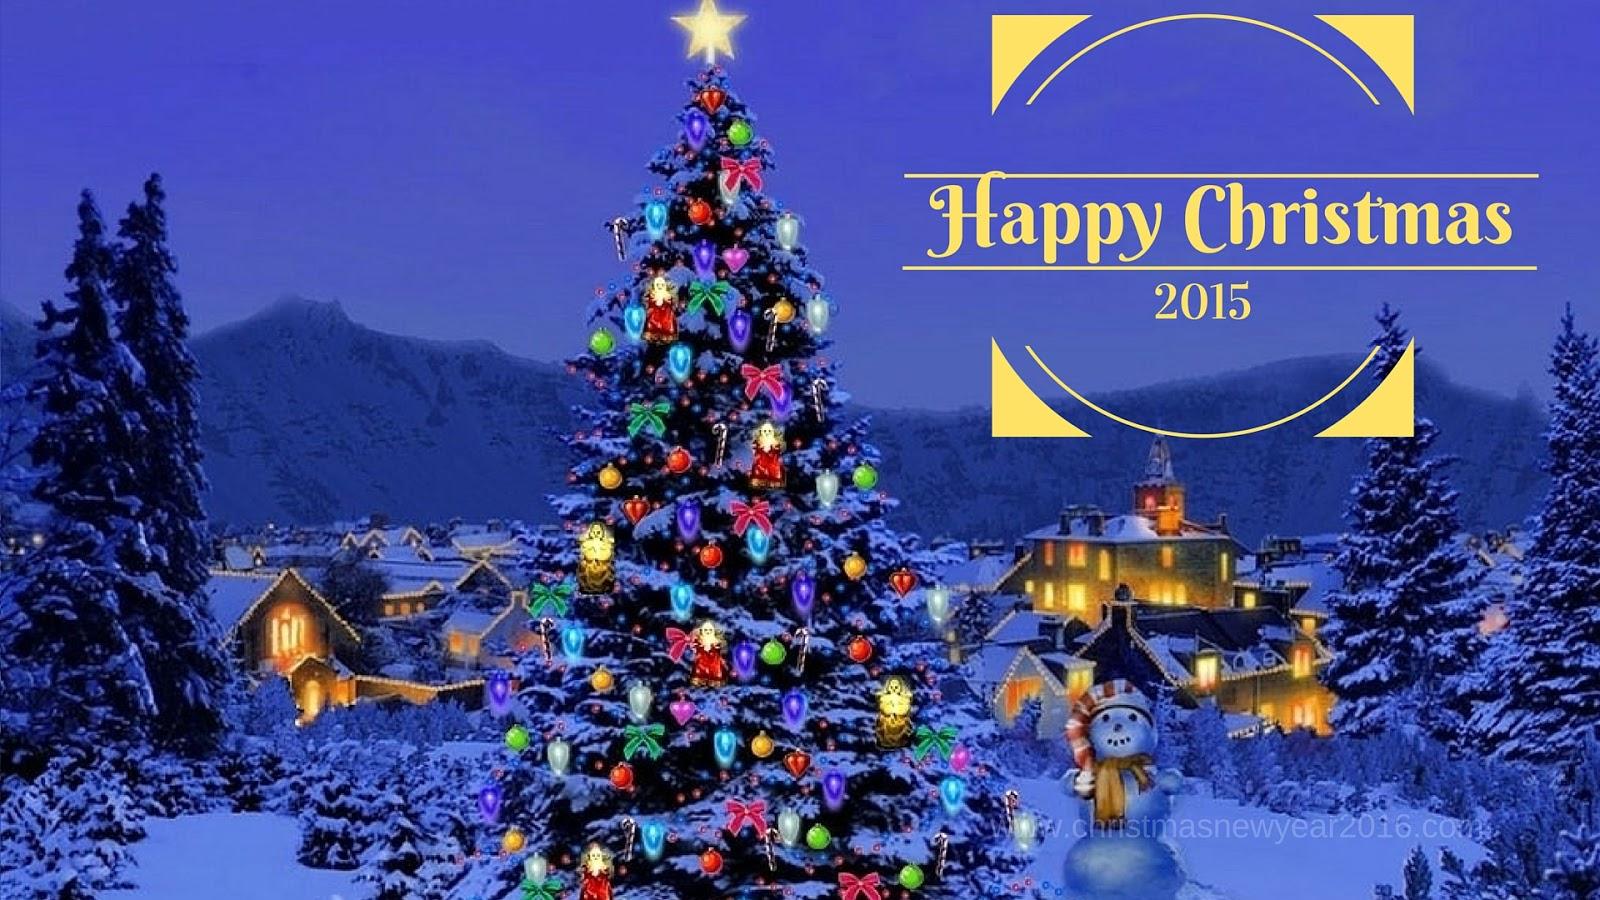 Must see Wallpaper Mountain Christmas - Happy-Christmas-2015-Tree-Bells-Decorations  HD_29049.jpg